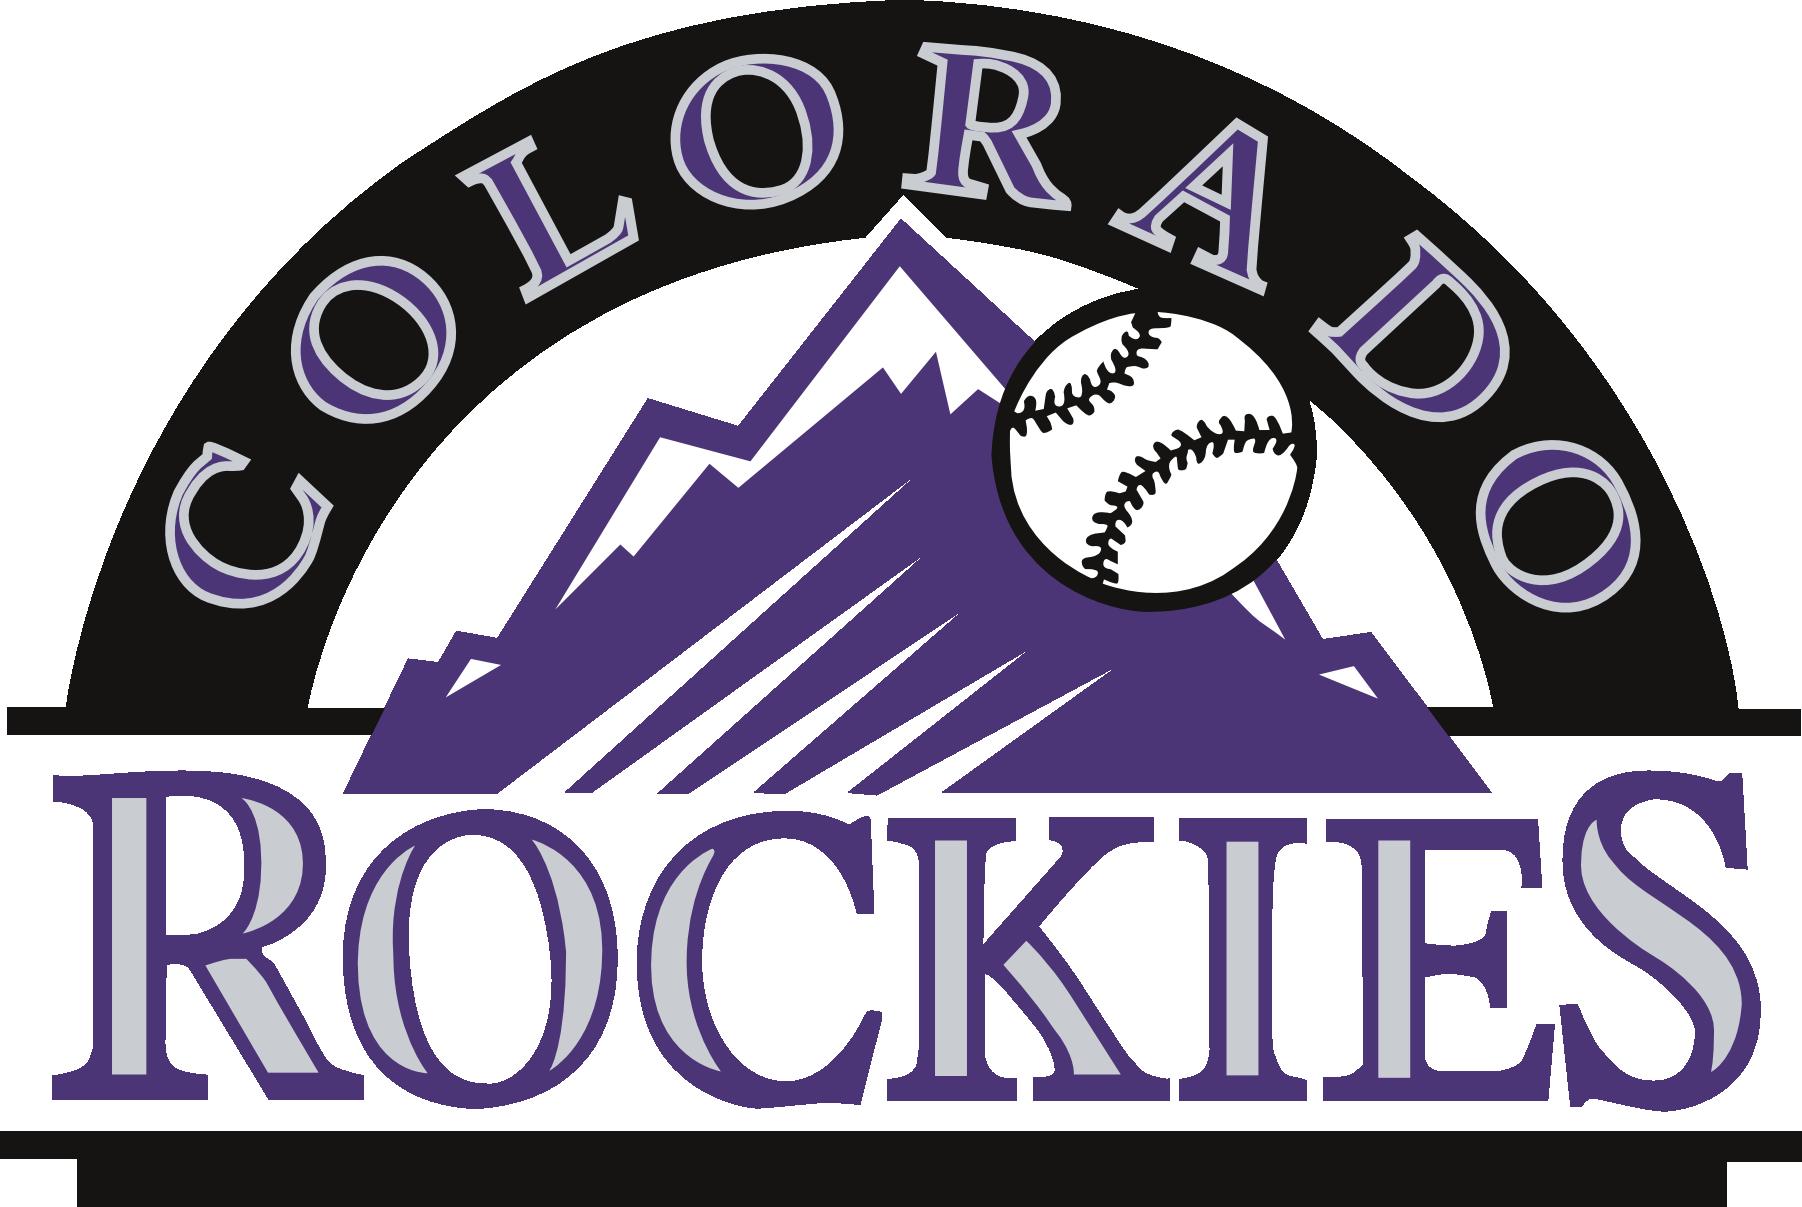 Colorado Rockies Baseball 1802X1207 id 187654 BUZZERG 1802x1207